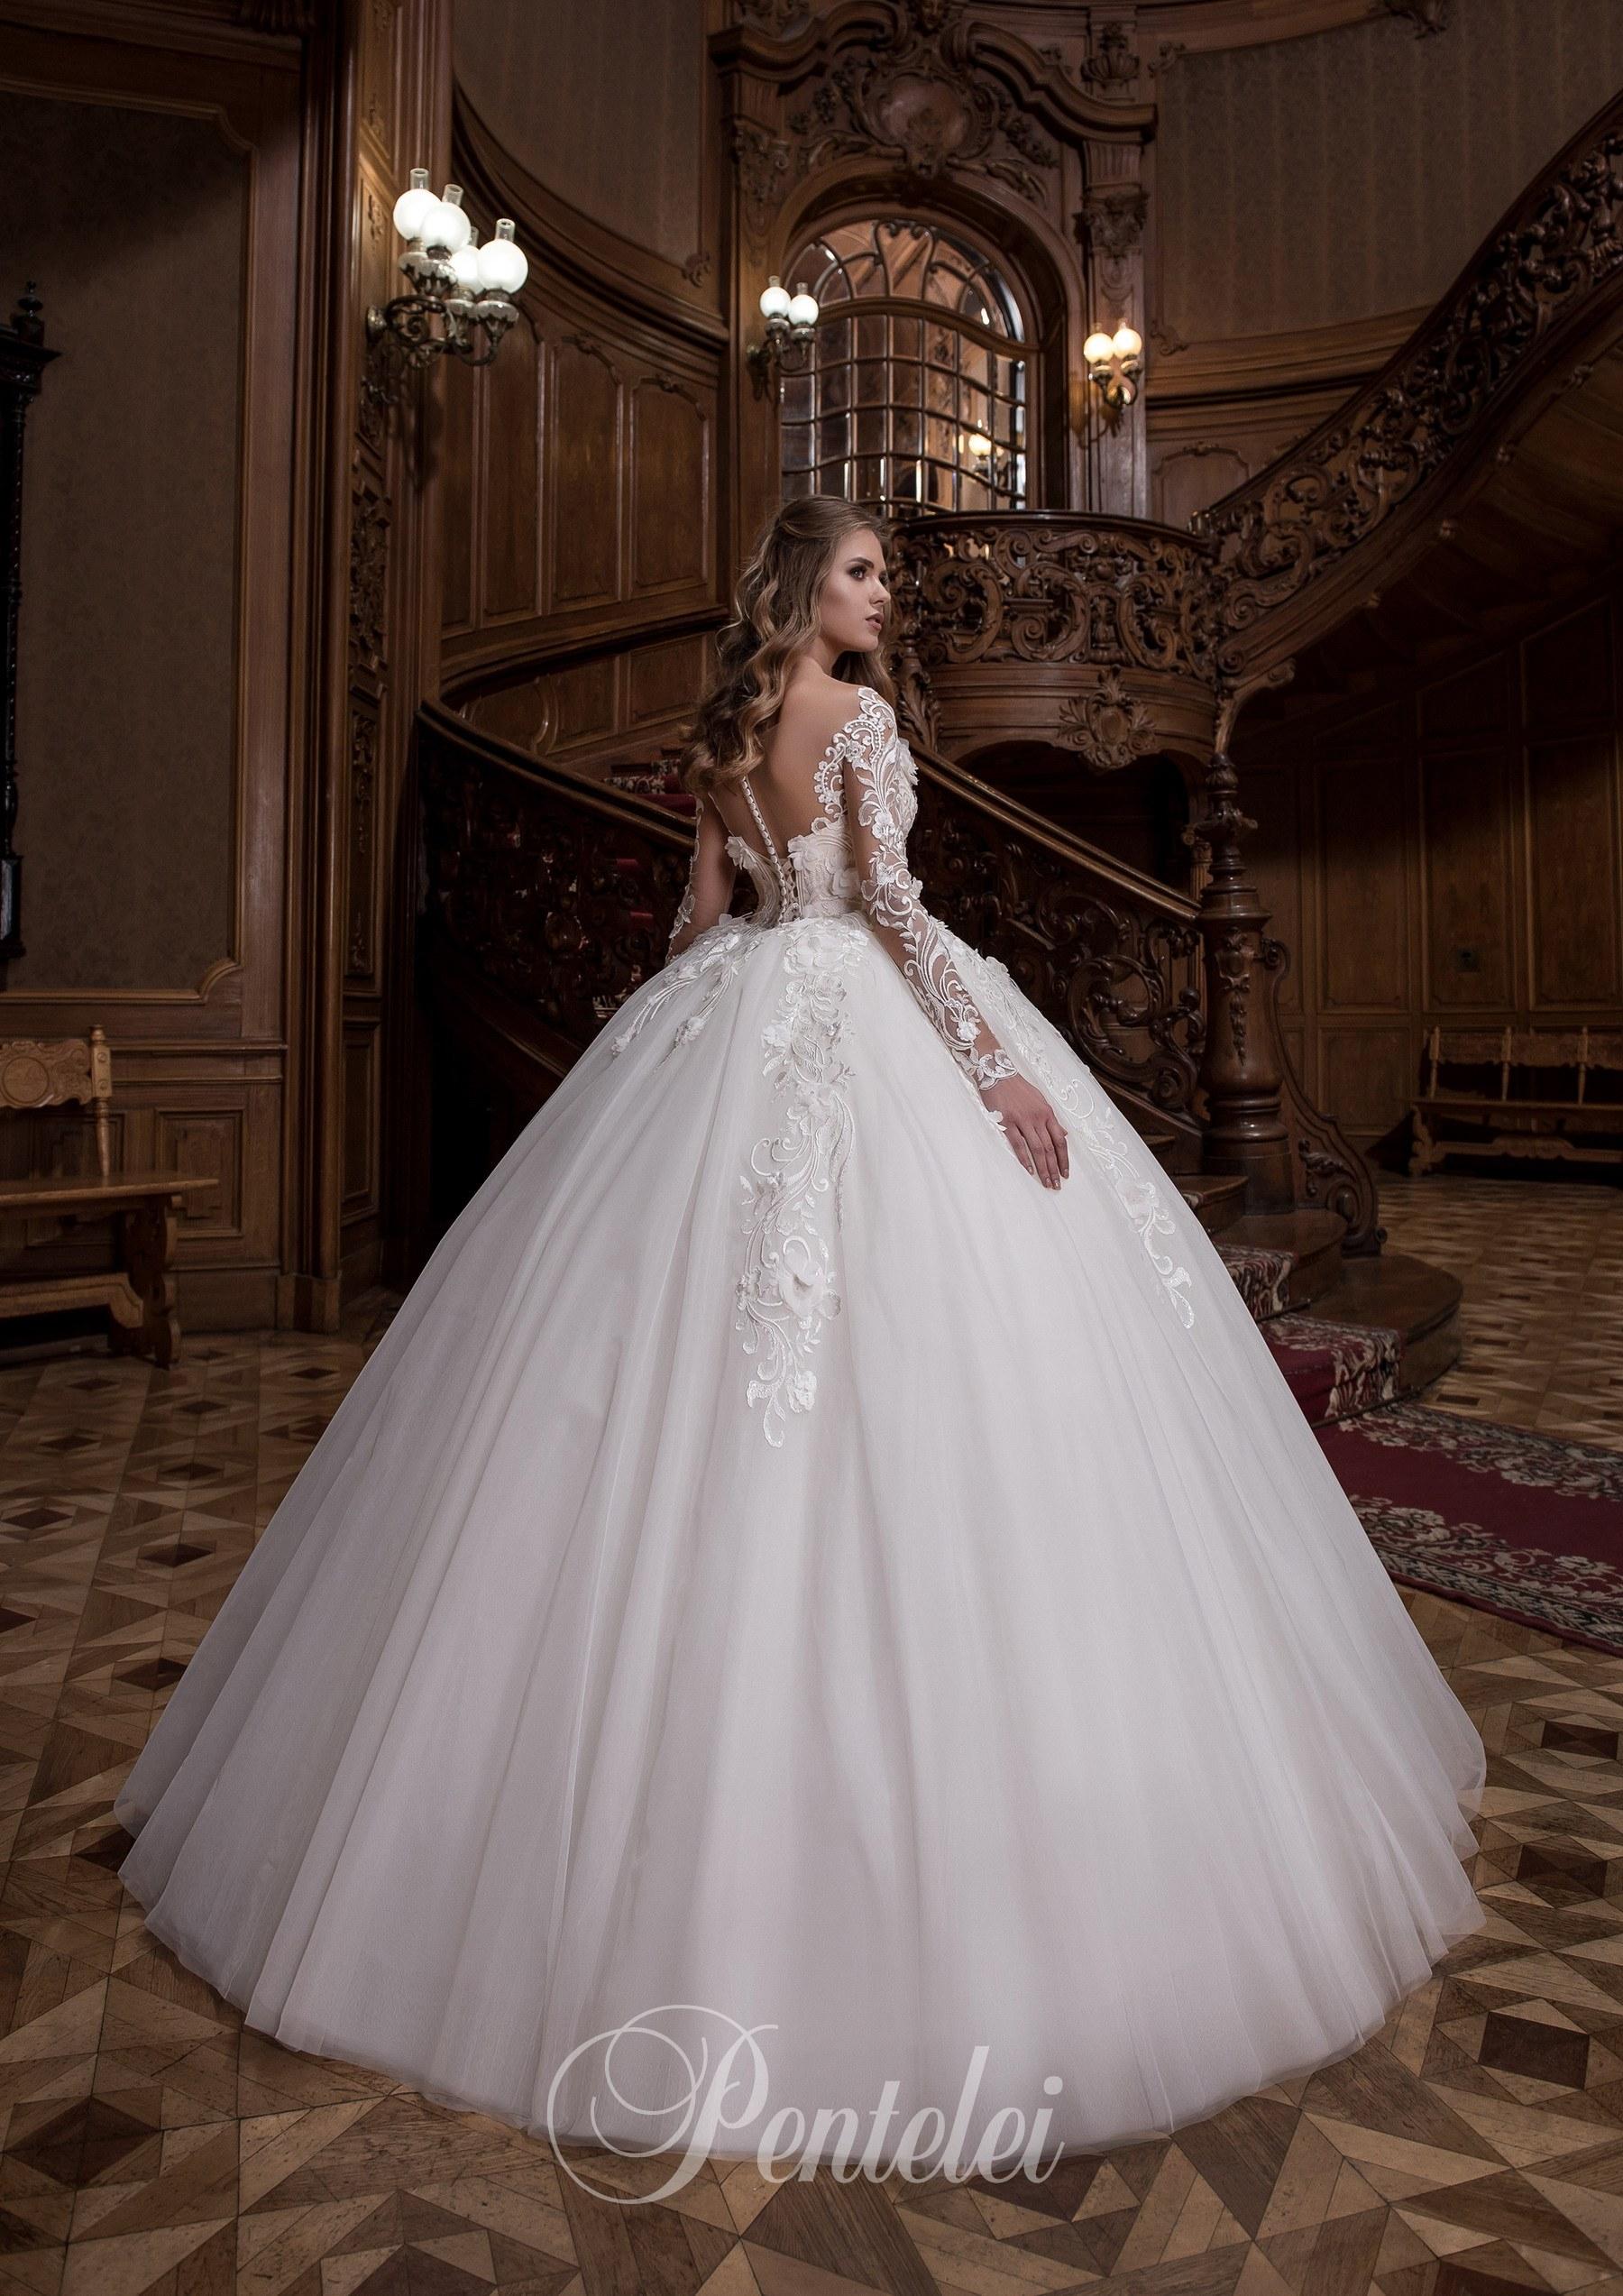 1710 | Buy wedding dresses wholesale from Pentelei